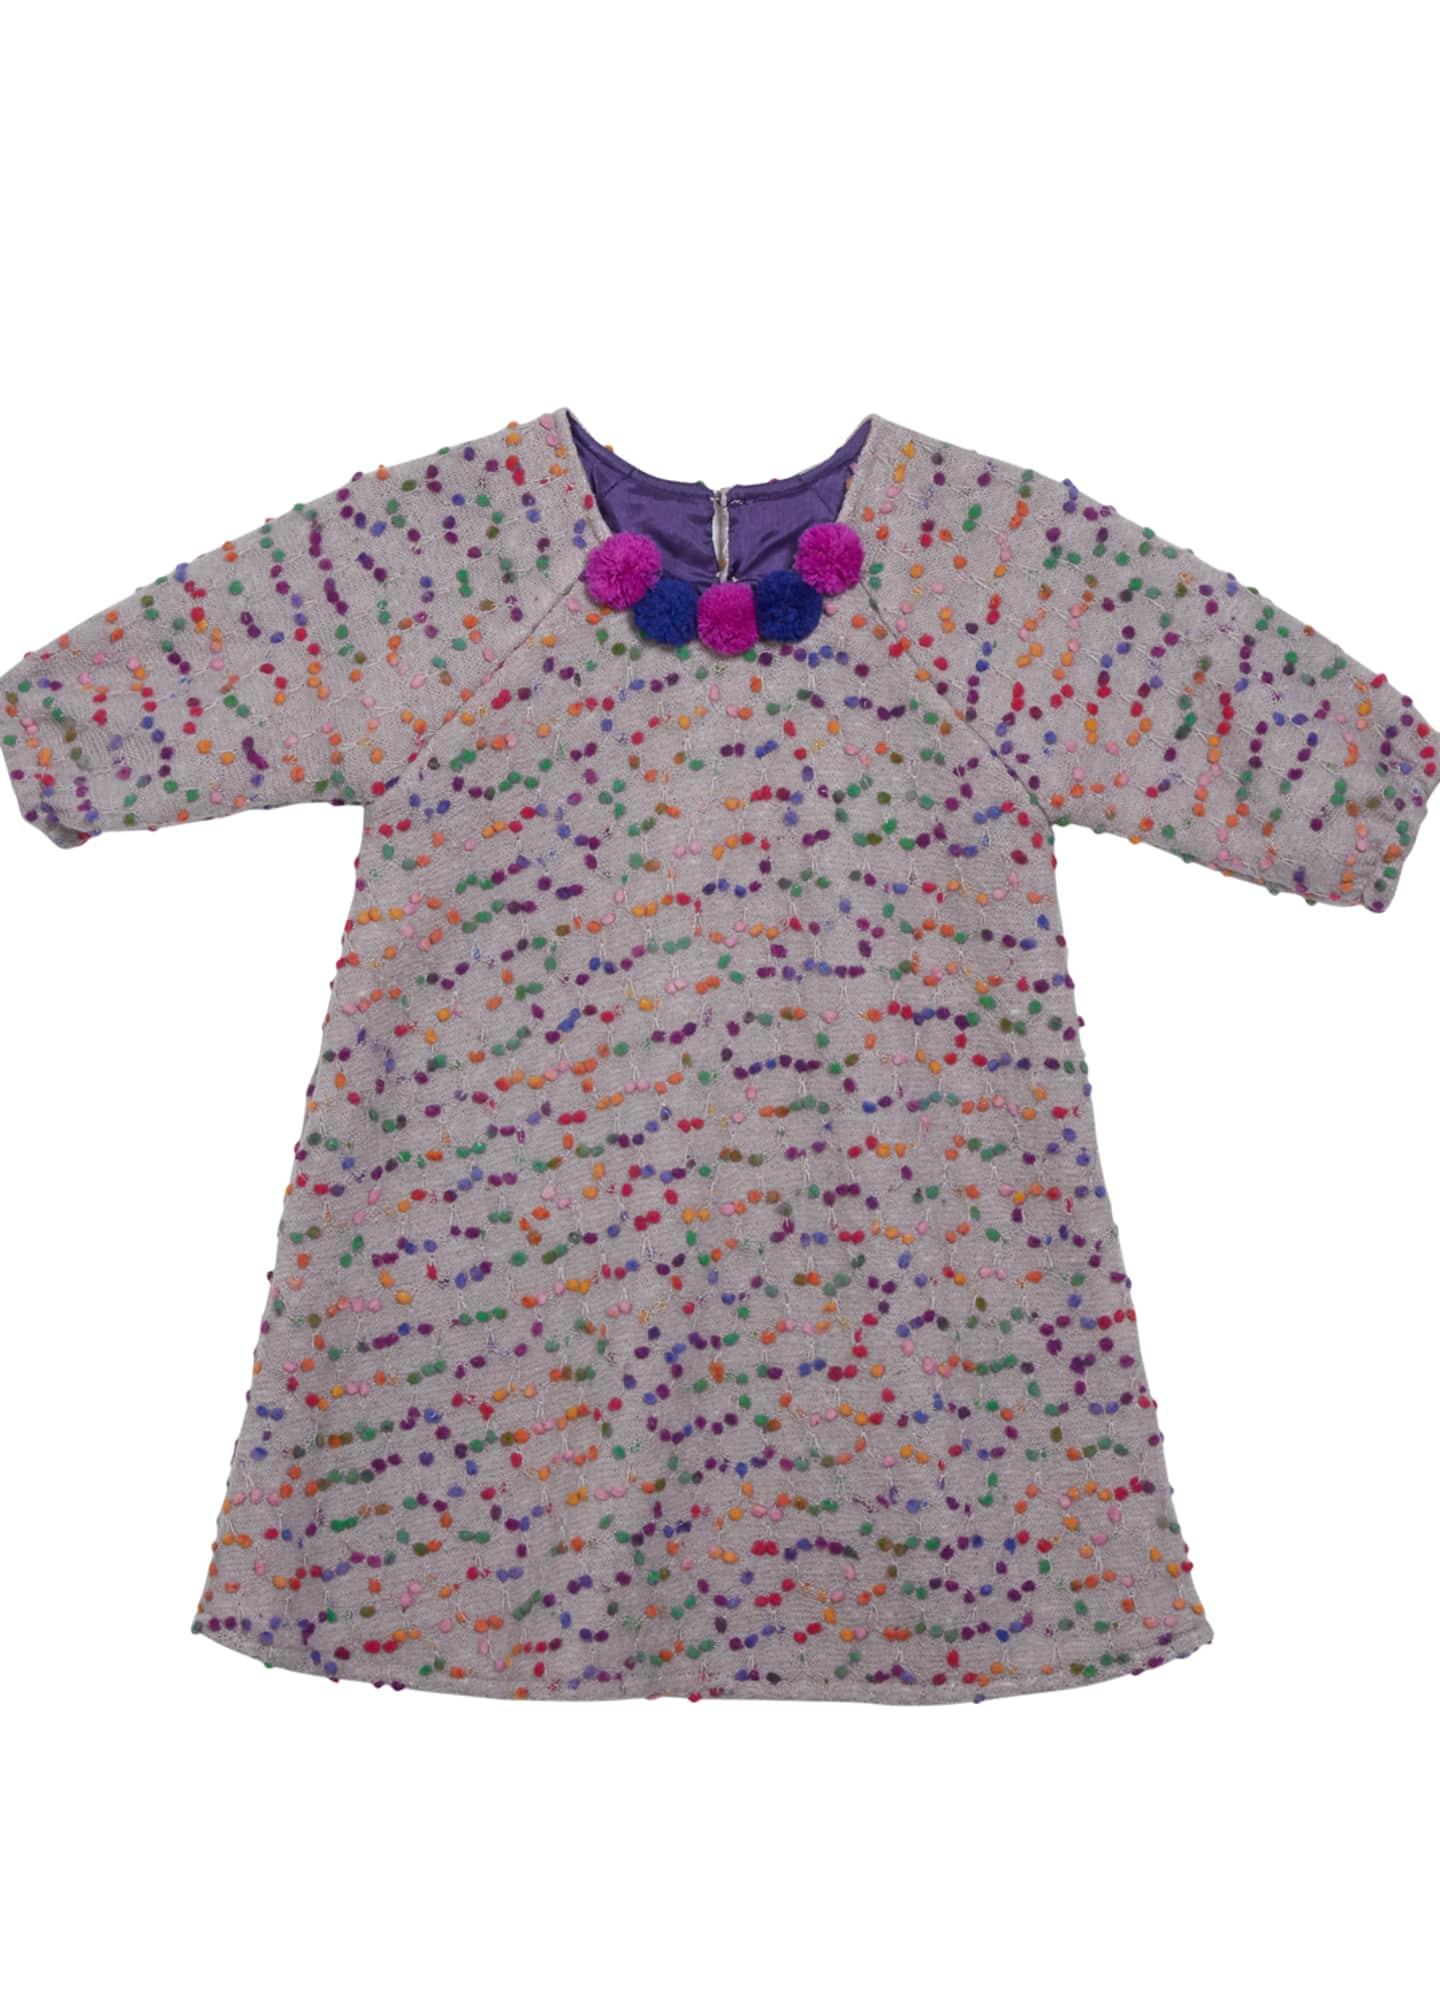 Isabel Garreton Confetti-Dotted A-Line Dress, Size 4-6